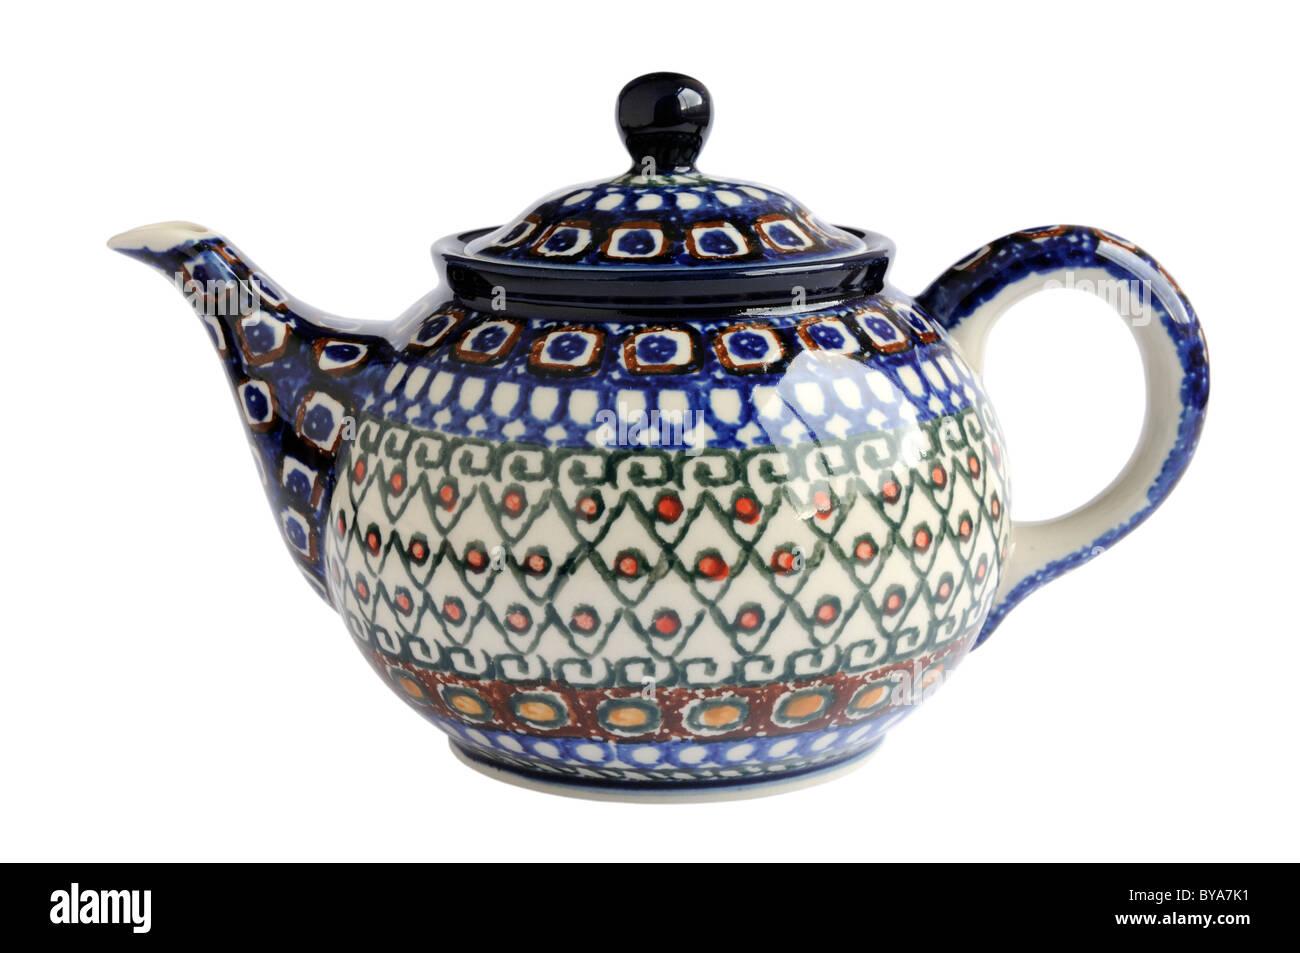 Handmade Polish pottery teapot  sc 1 st  Alamy & Handmade Polish pottery teapot Stock Photo: 34031621 - Alamy